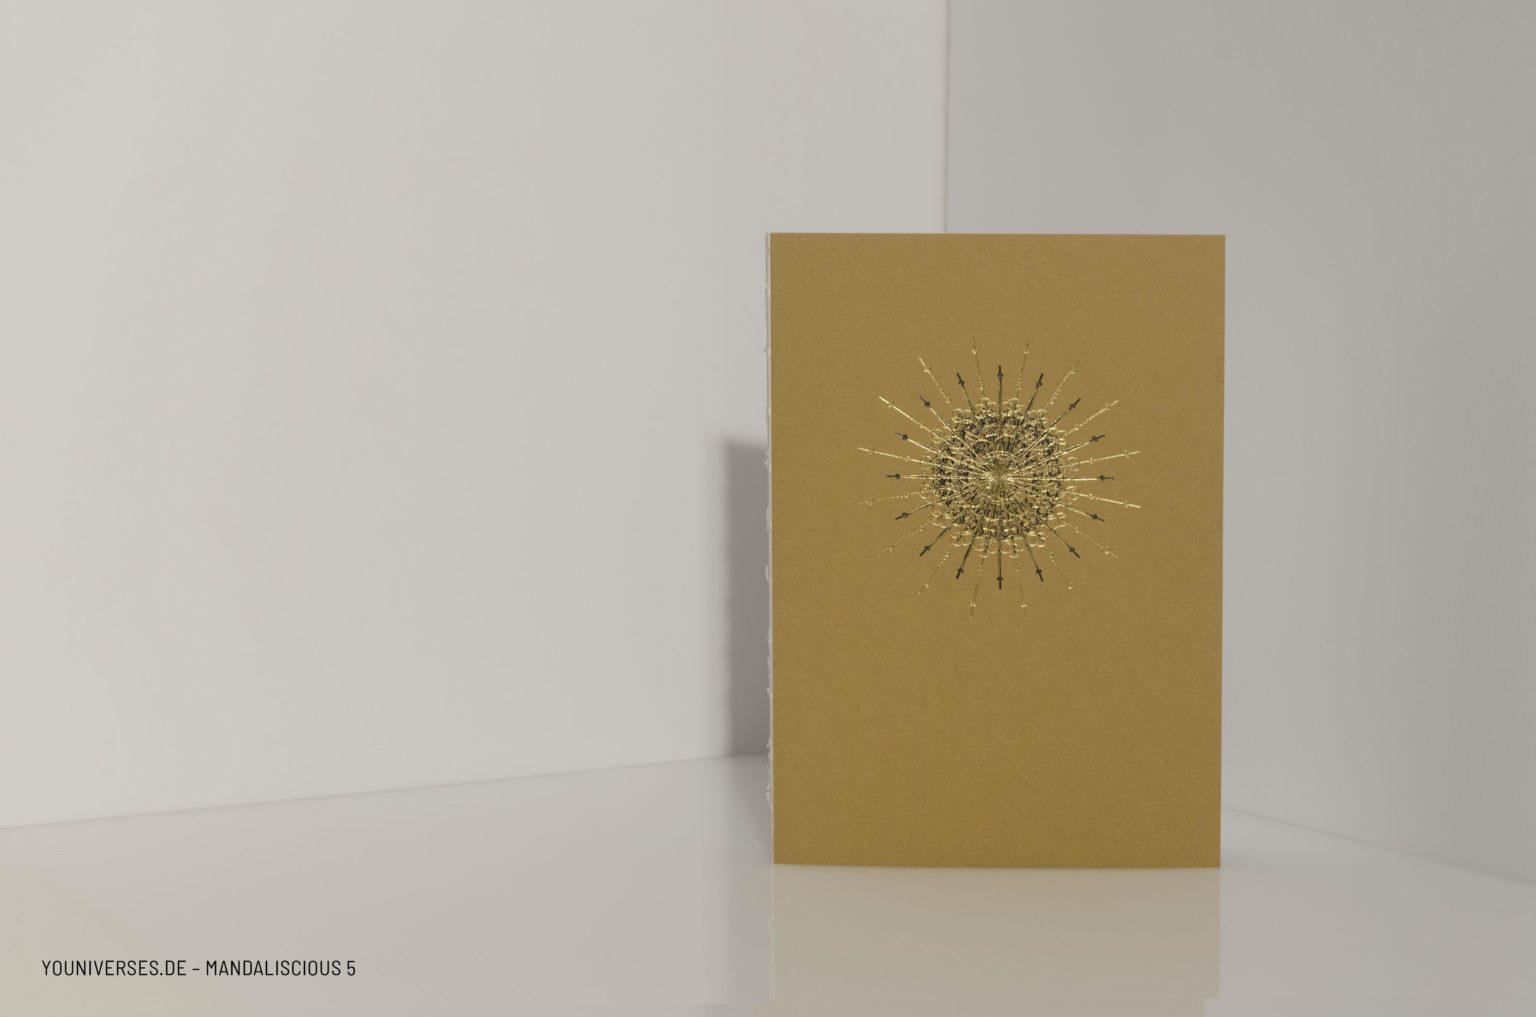 Youniverses, Reihe: mandaliscious Design-N°.: 5, Farben: Schwarz & Gold, Yournal, Journal, Diary, Bulletjournal, Tagebuch, Skizzenbuch, Veredelung, DIY, Handmade, Papeterie.